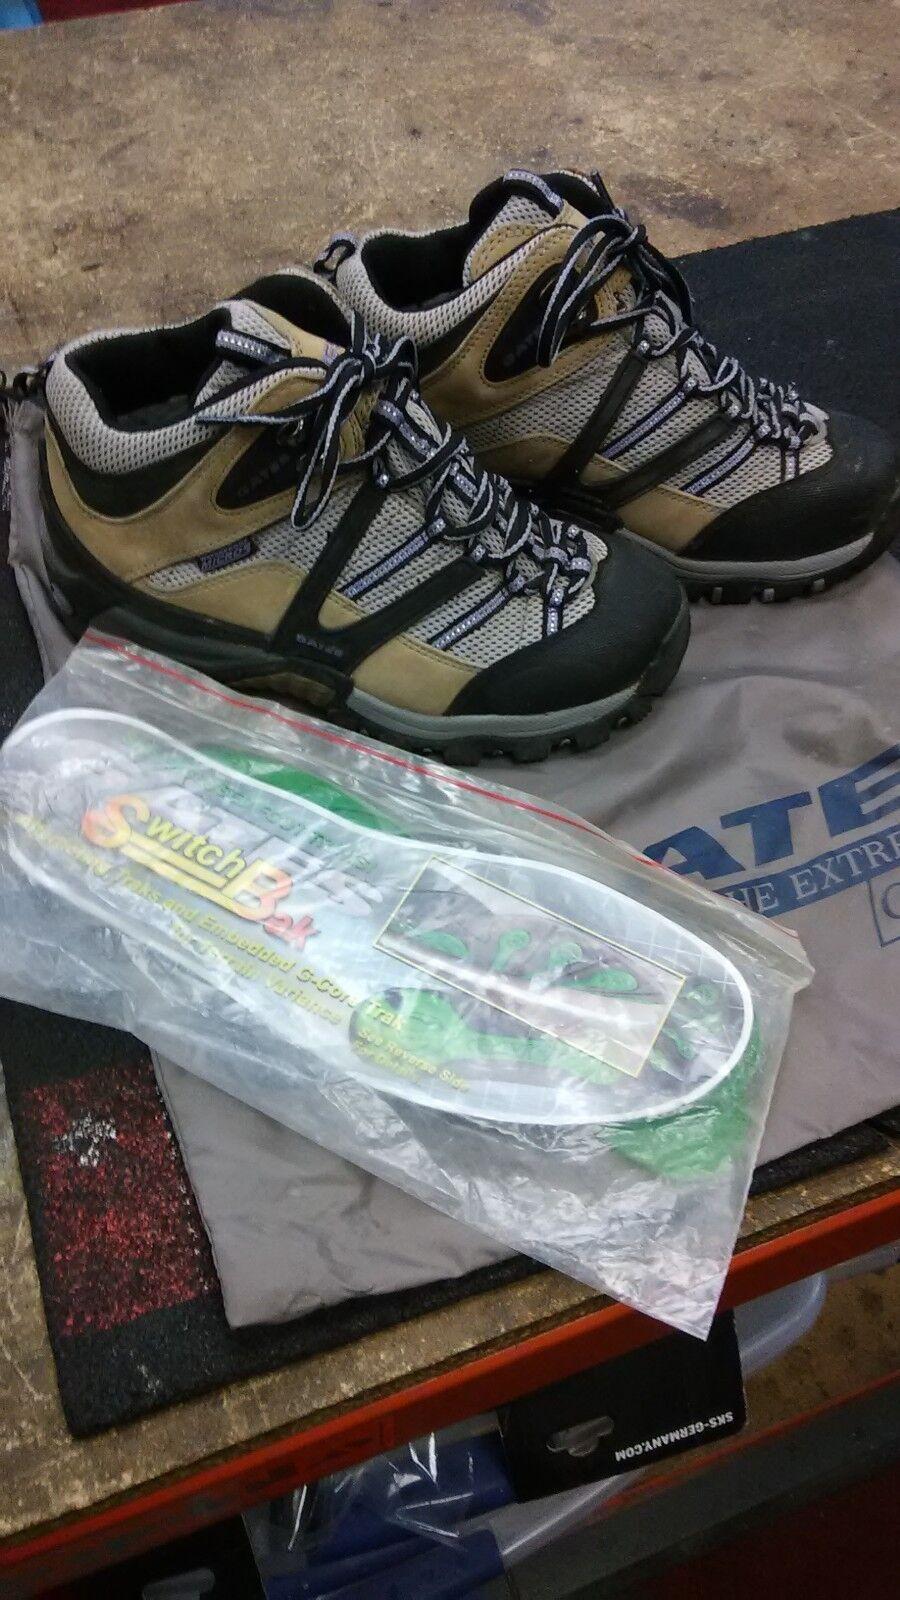 Gates Women's Hiking Boots, light use, nwot.  Size 7.5